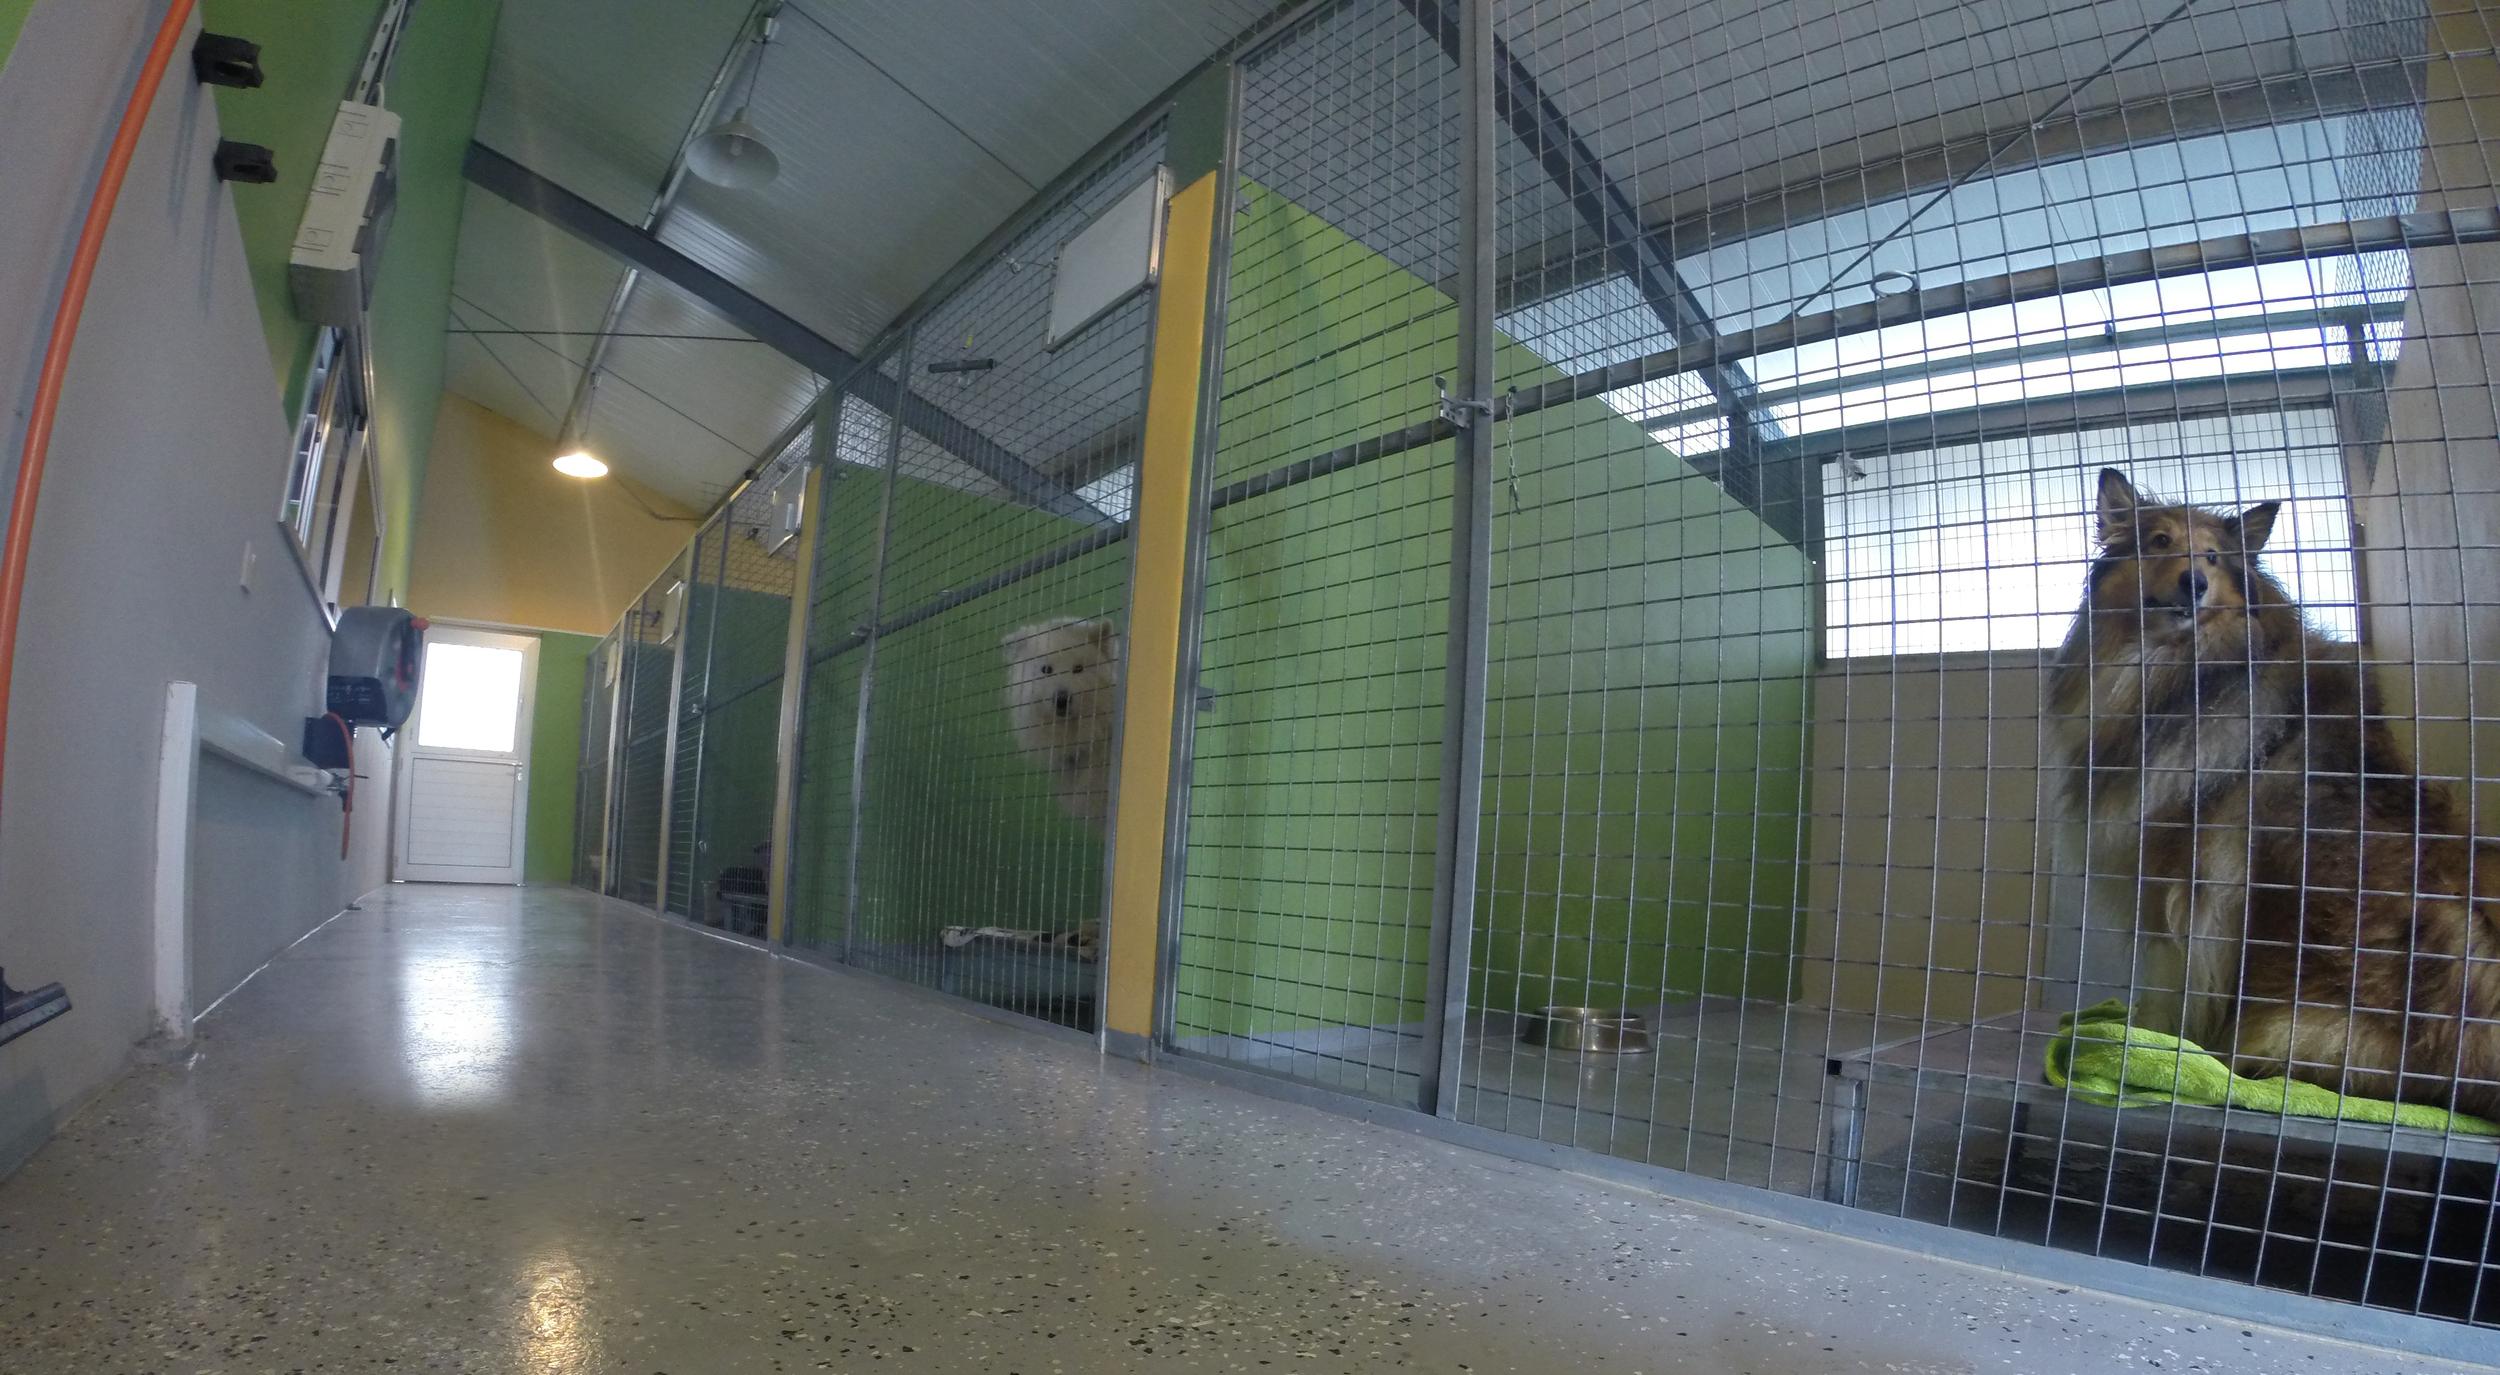 dog_ranch_cyprus_dog_hotel_indoor_kennels.jpg